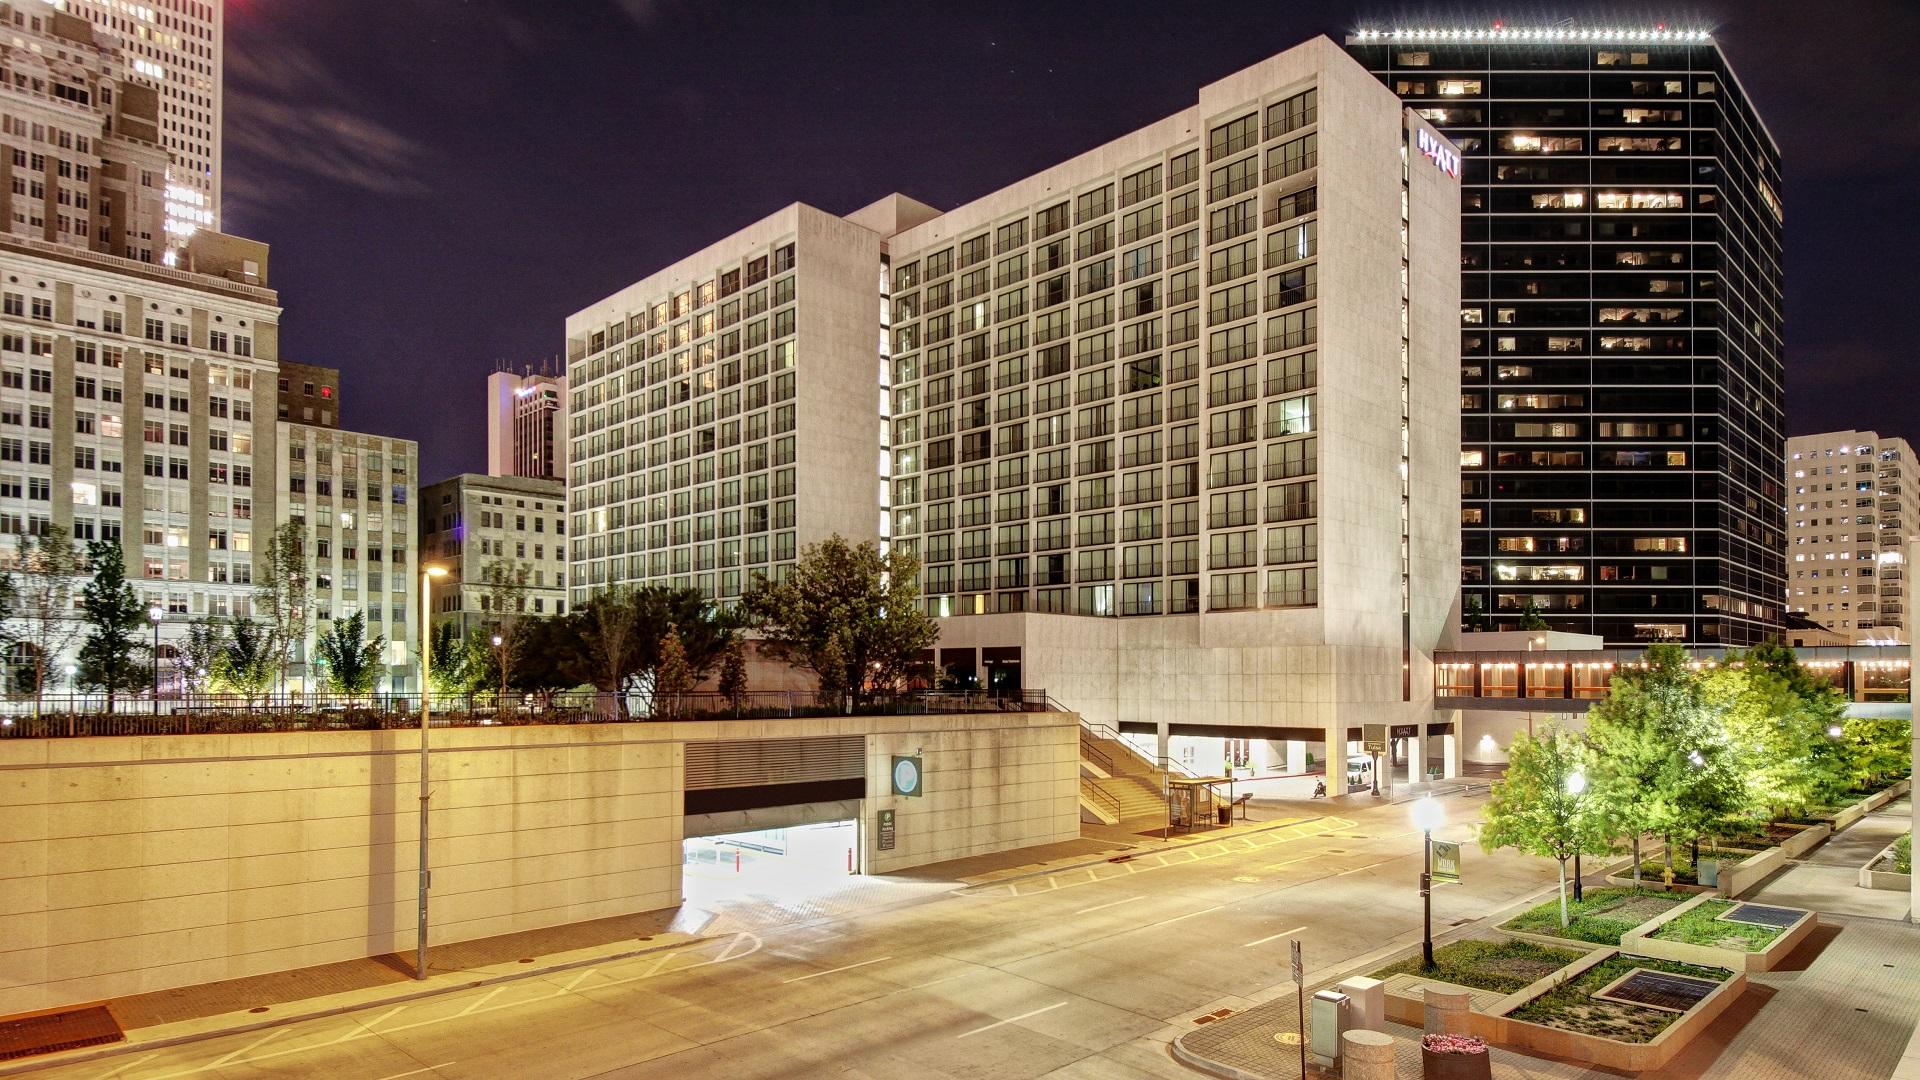 Hotel Photo - Outside Night Shot